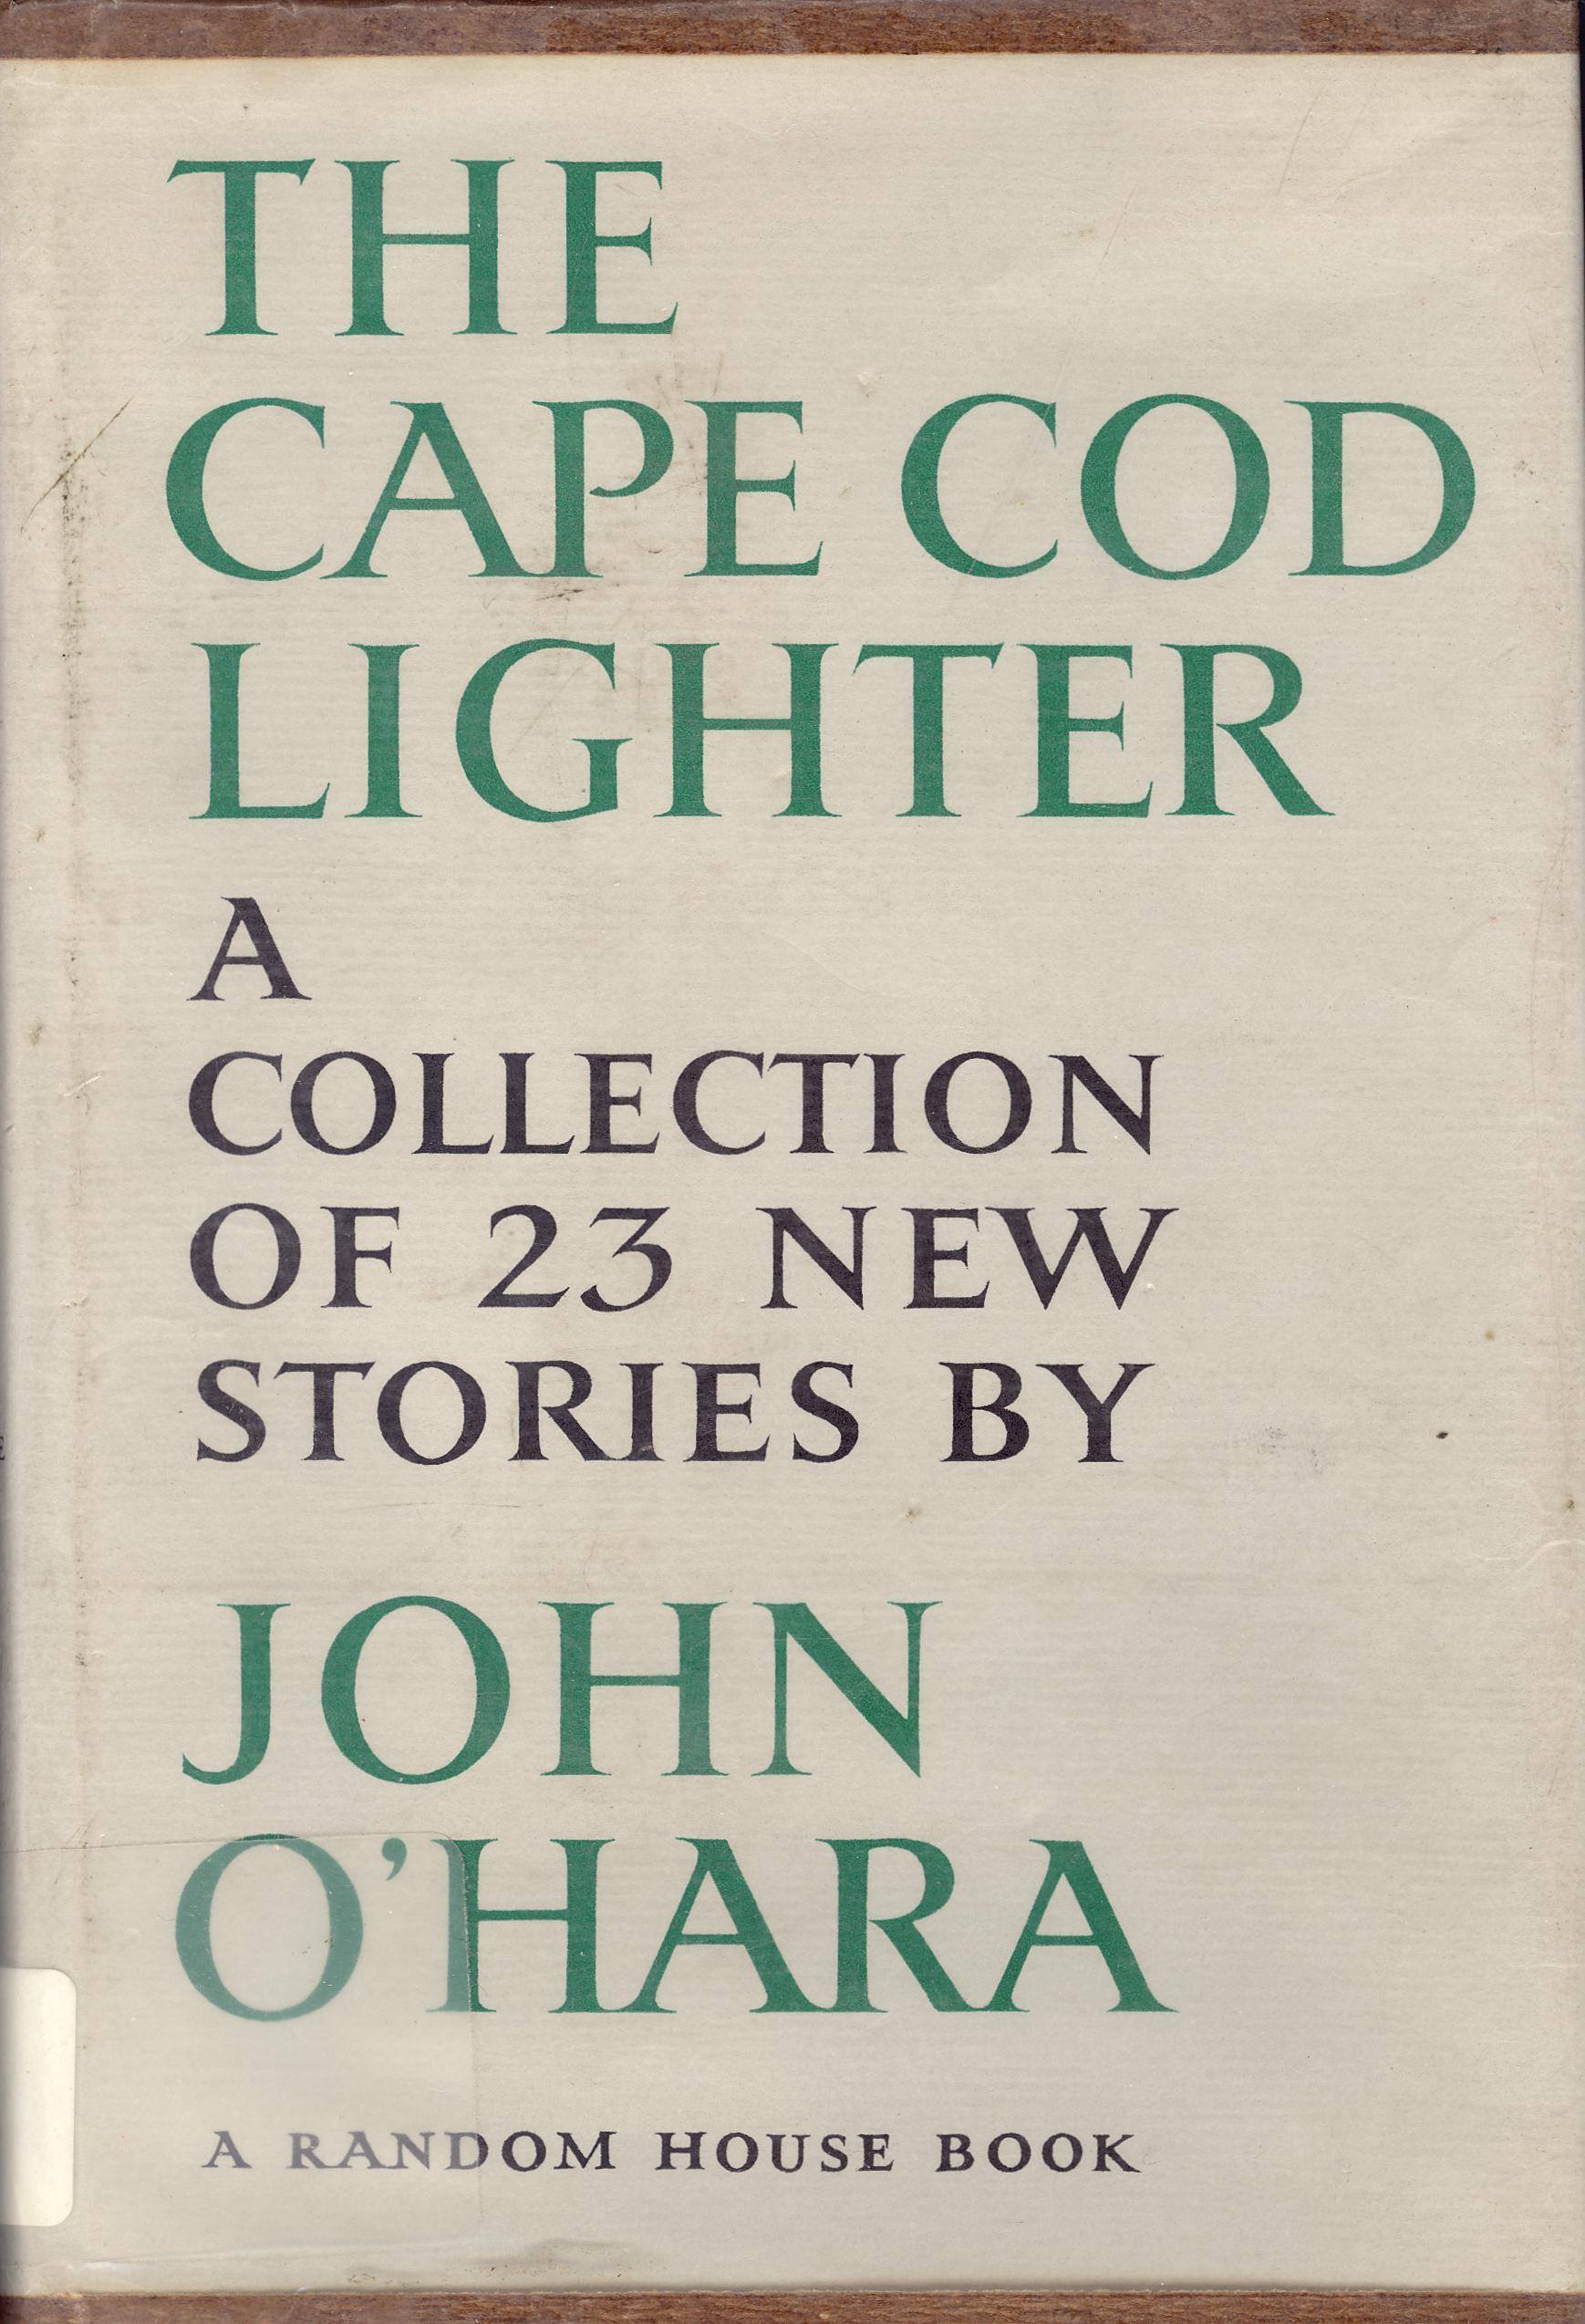 The Cape Cod lighter